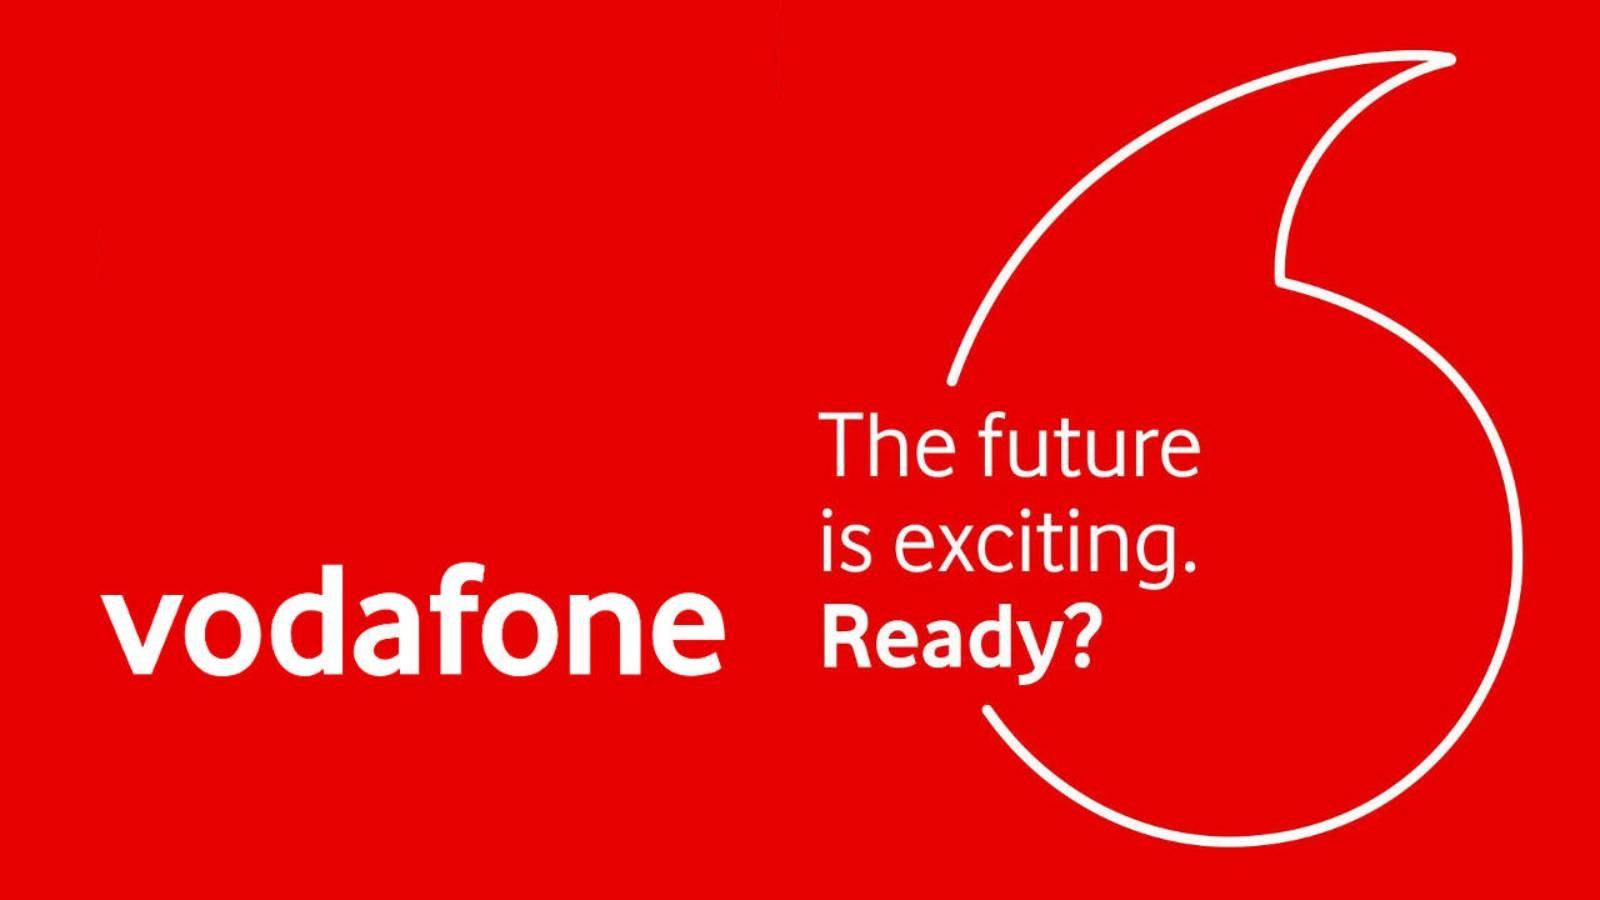 Vodafone food